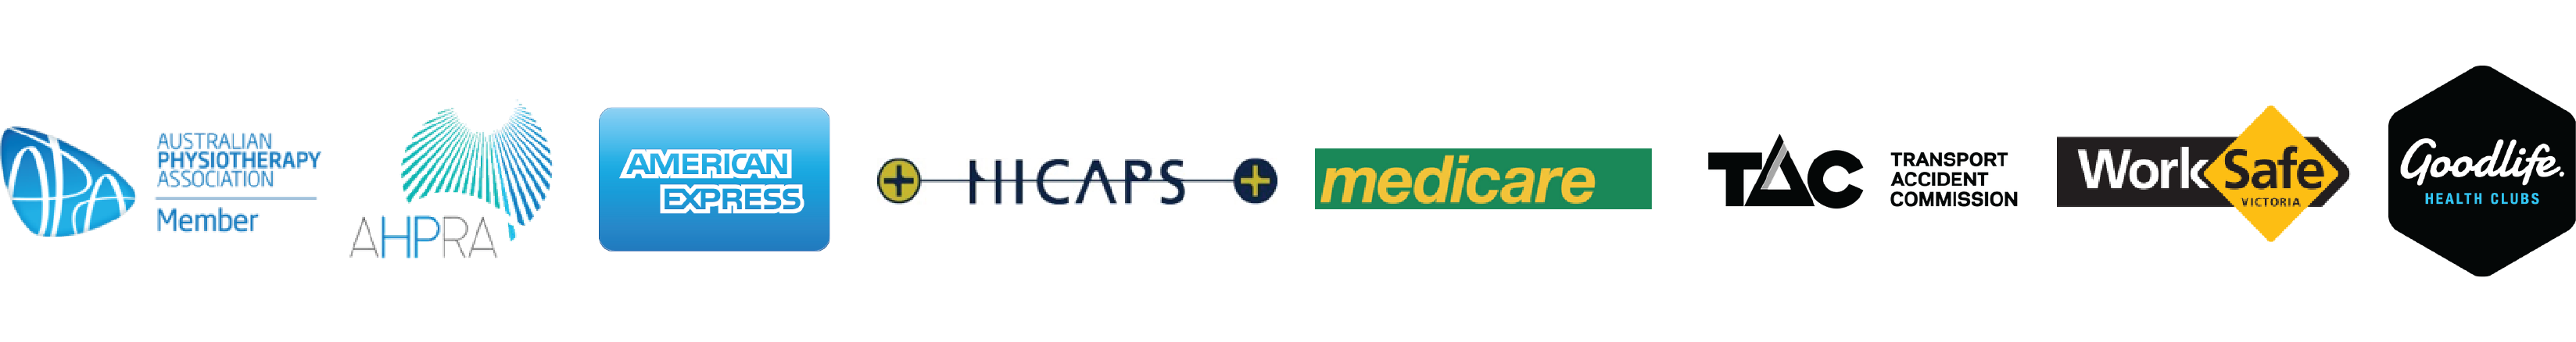 Affiliates Logos